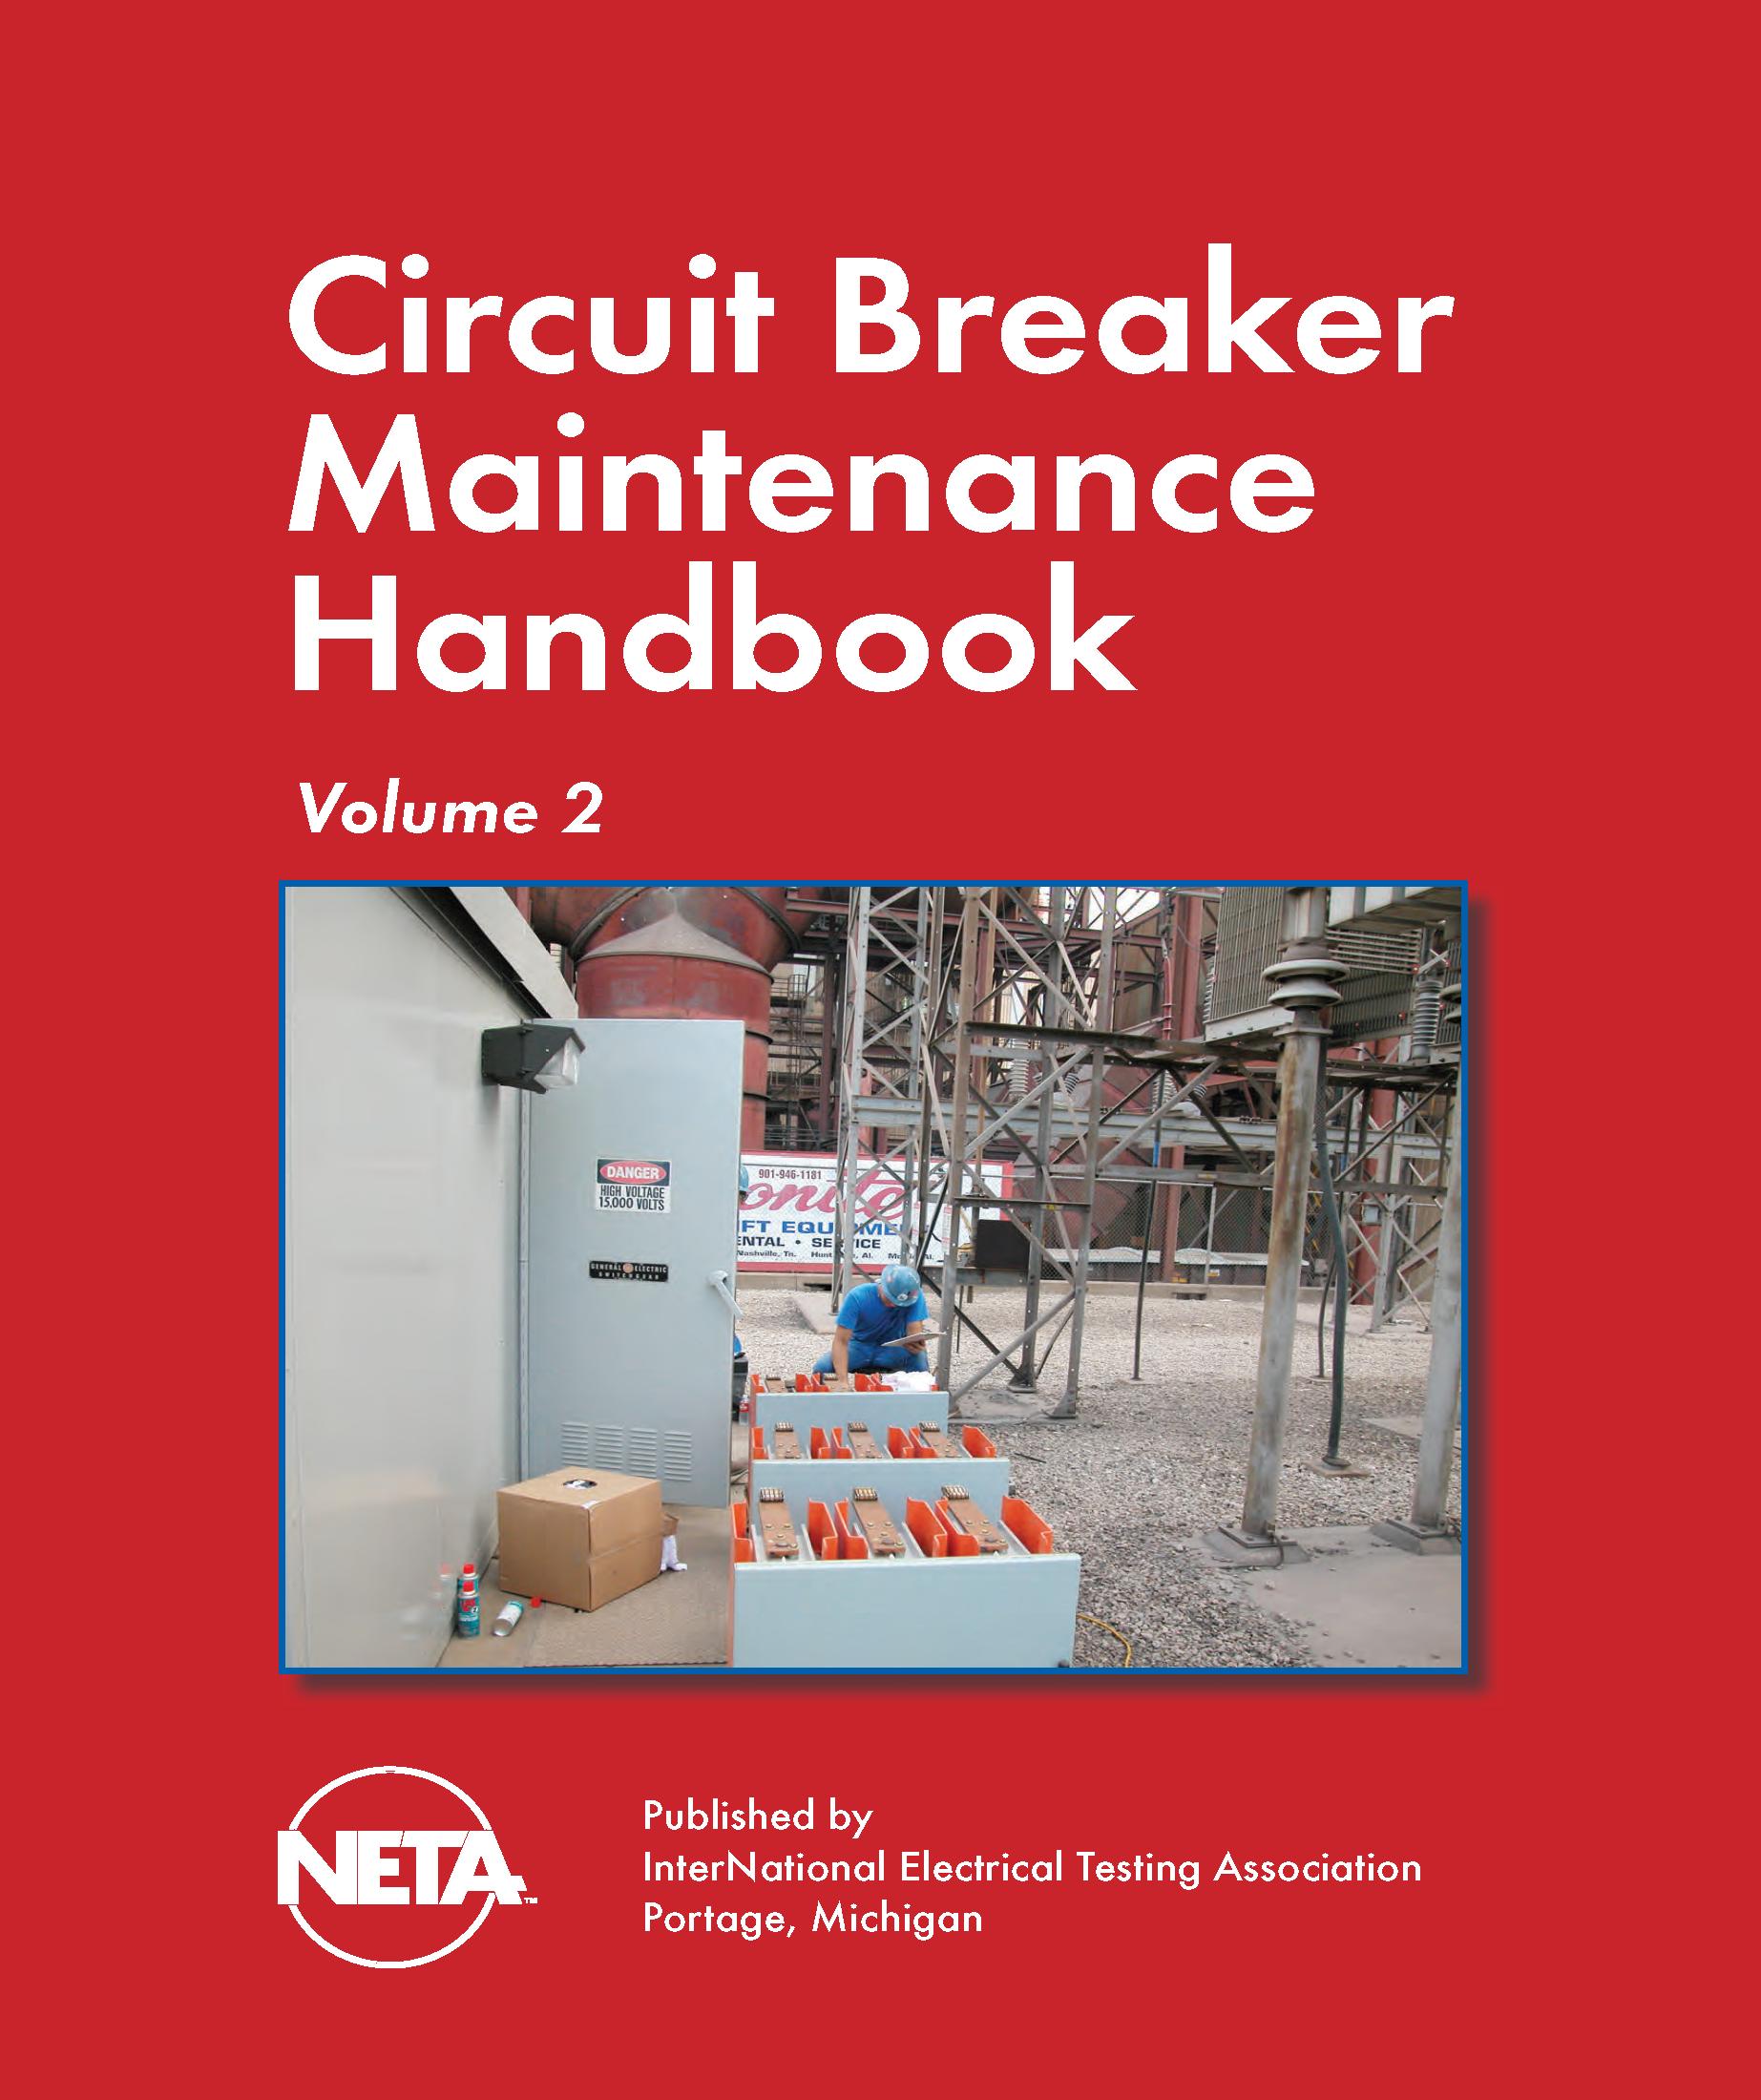 Self Serve Portal Electrical Relay Maintenance Pdf Circuit Breaker Handbook Volume 2 Series I